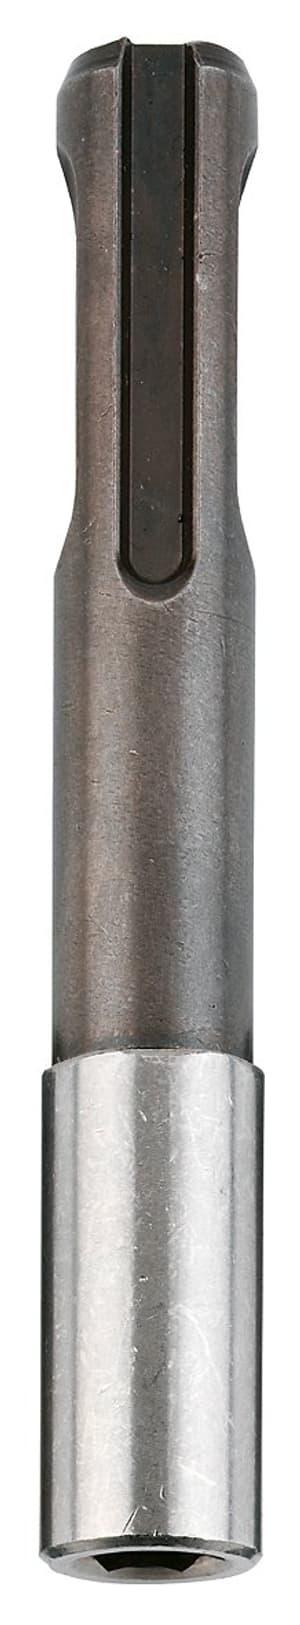 "SDS PLUS Halter Edelstahlhülse 1/4"" 75 mm, 1 Stk."